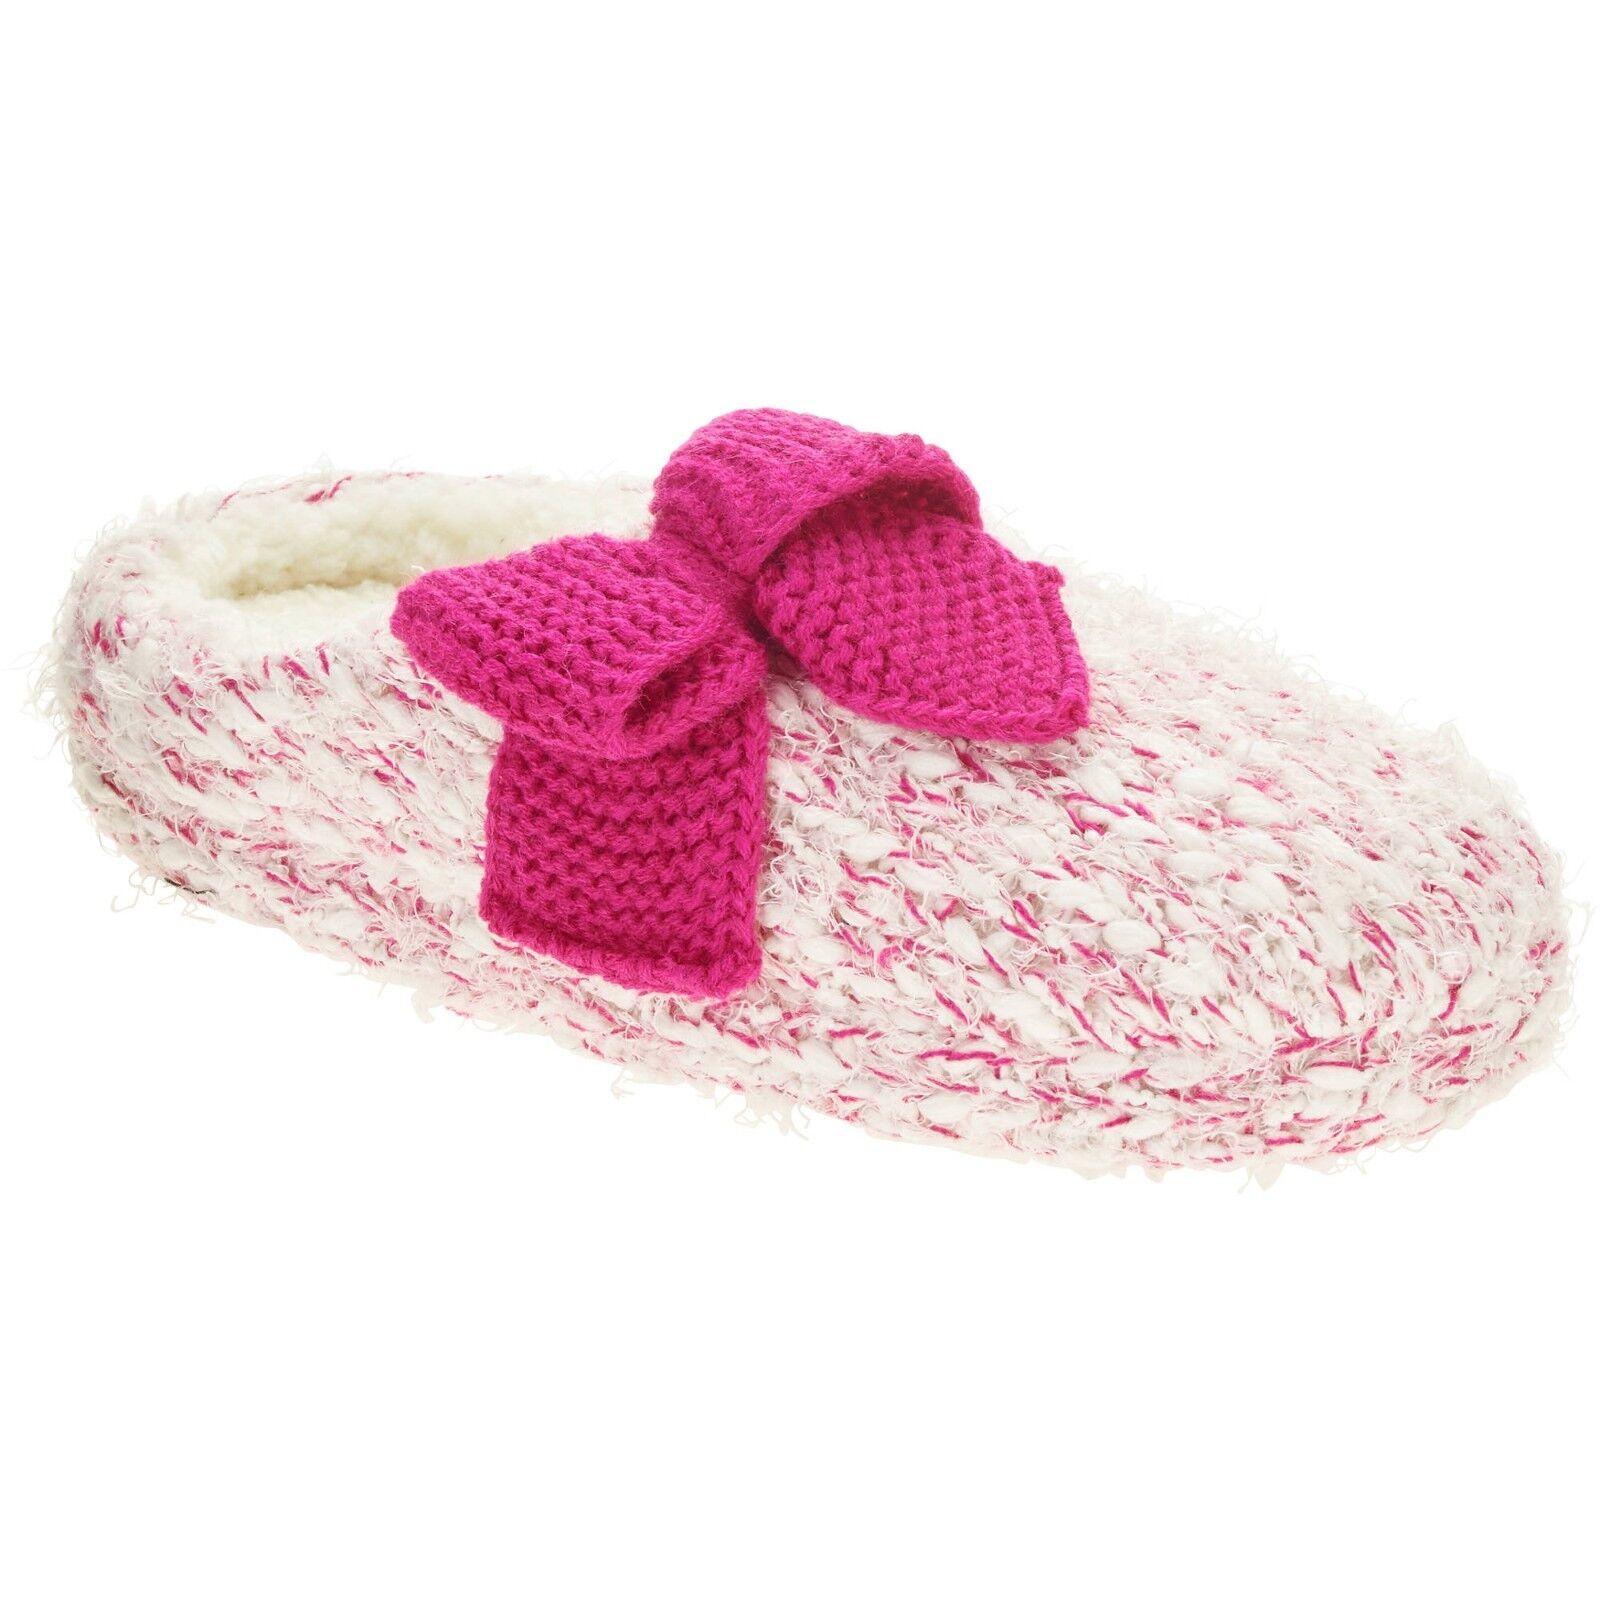 Walmart Brand Women's Pop Knit Clog Slippers Fuchsia W Bow Size Medium 7-8 NEW